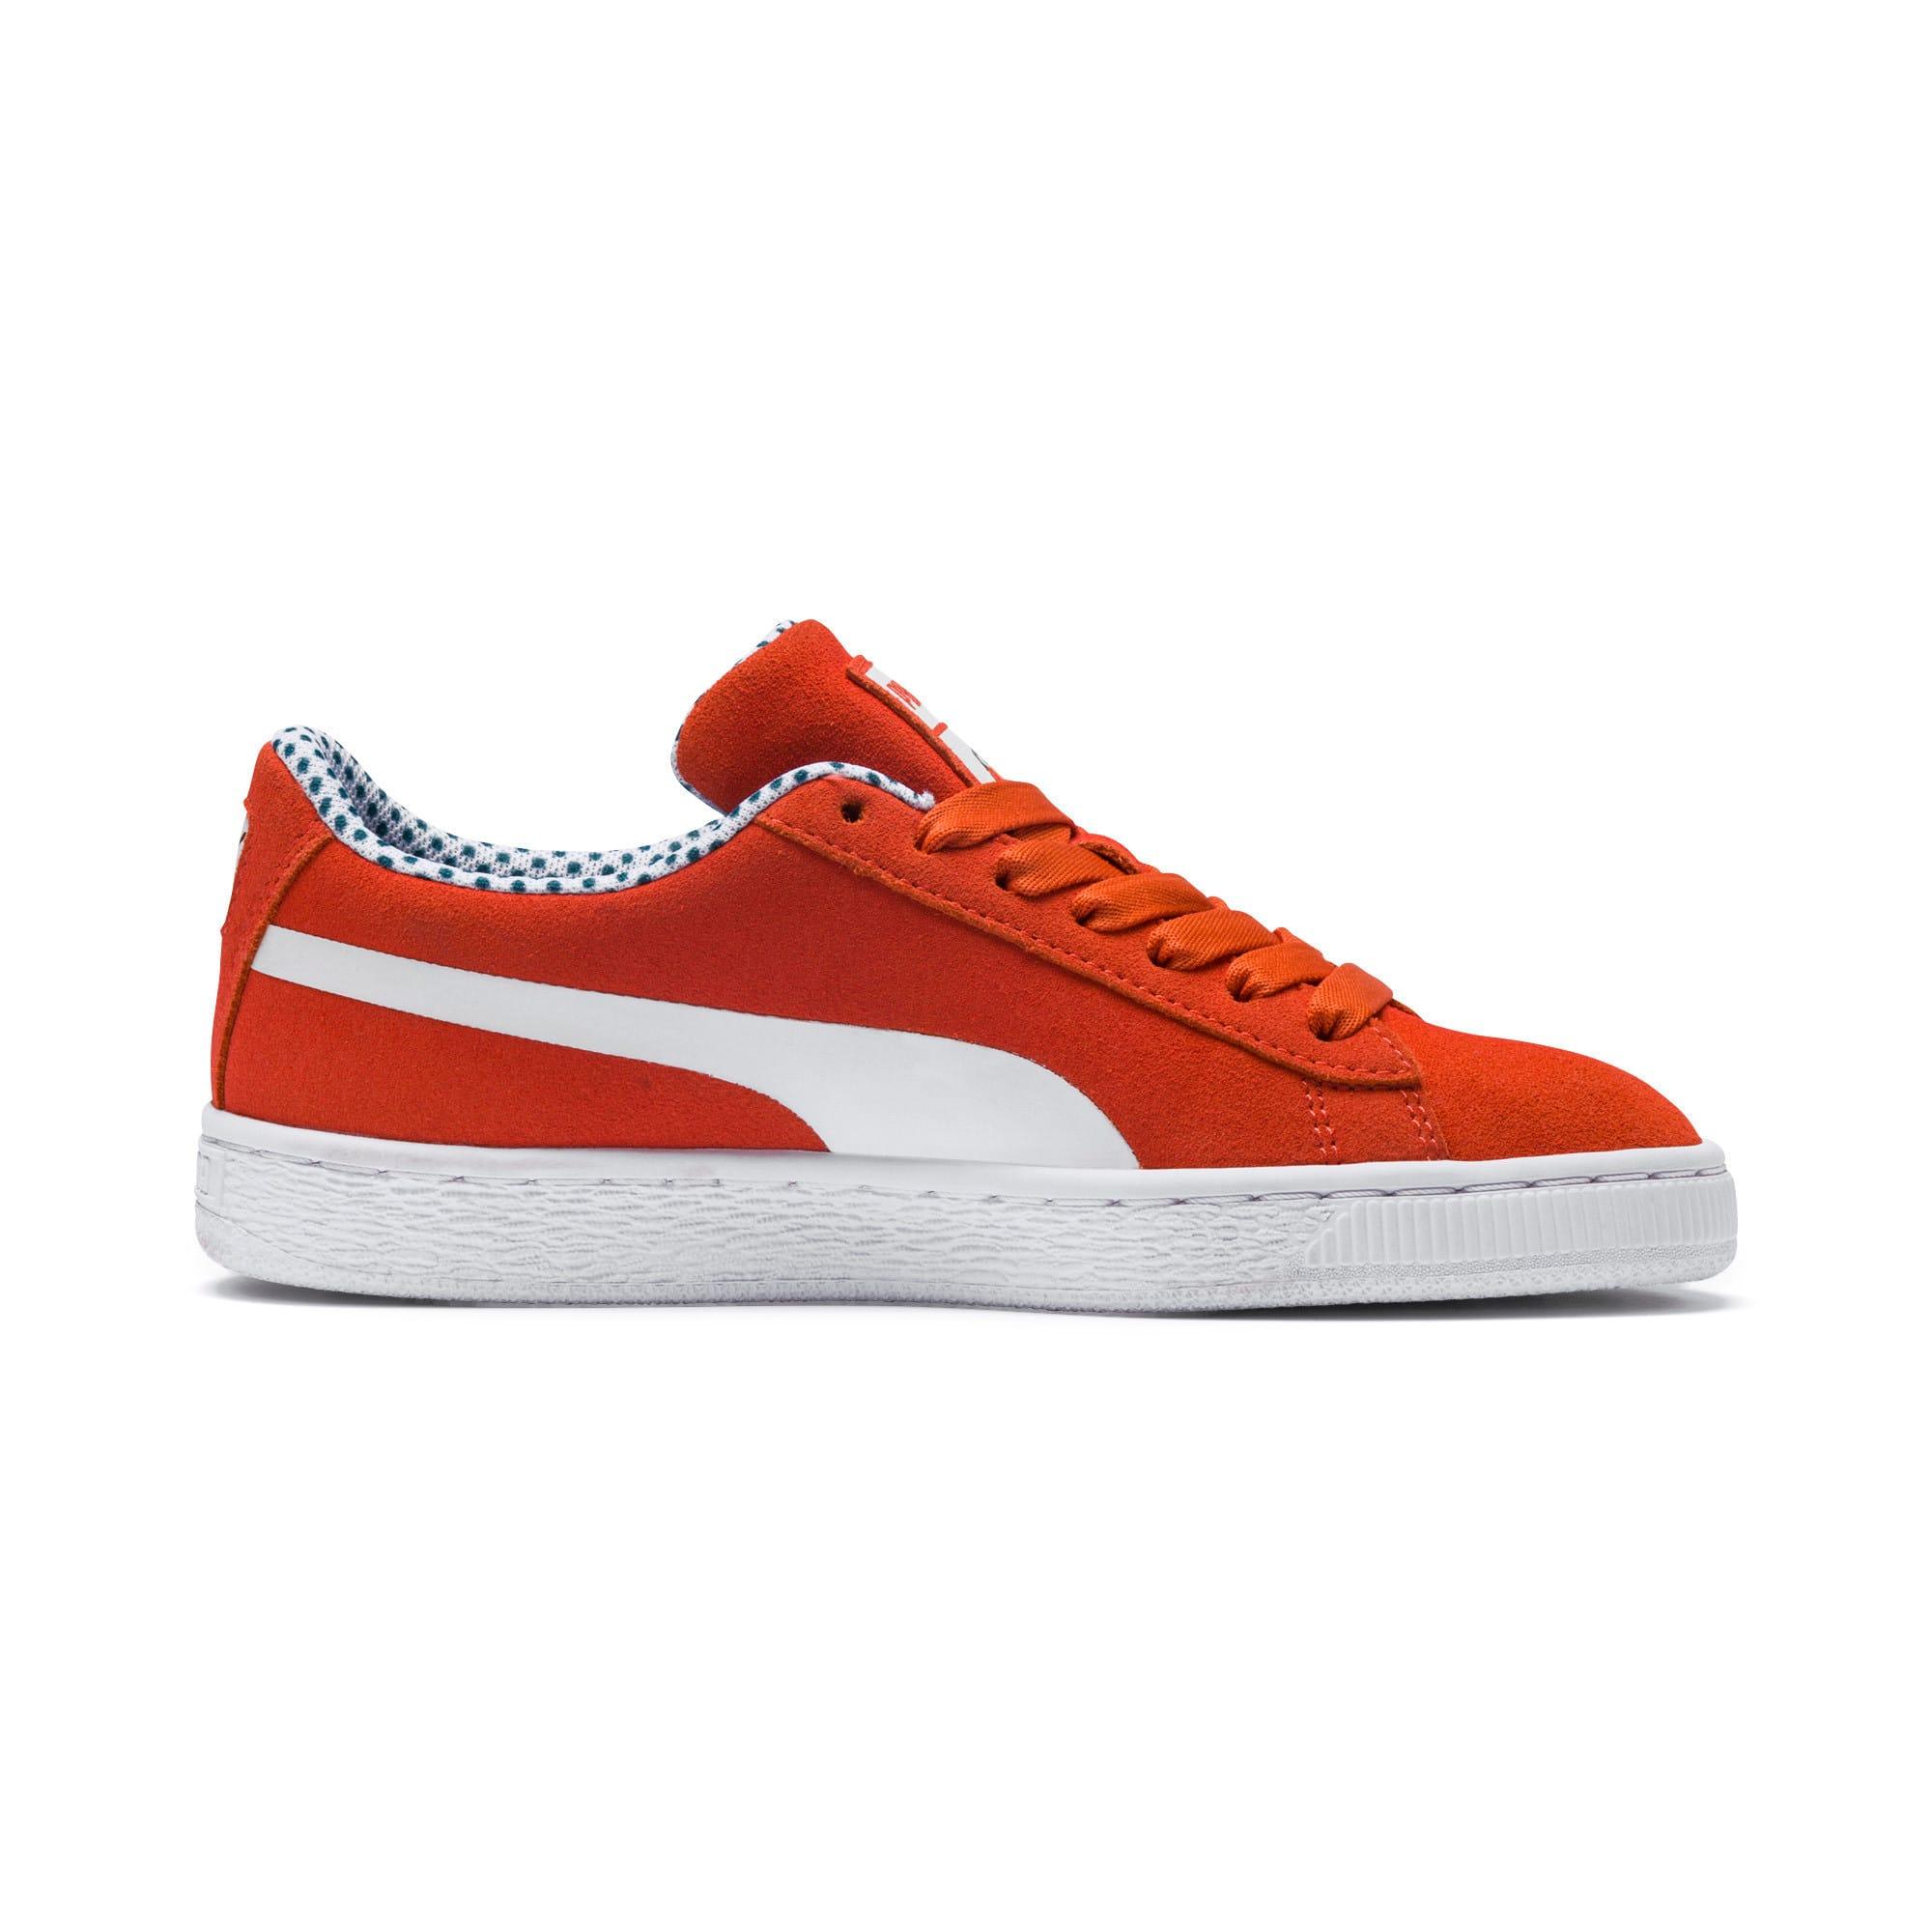 Thumbnail 5 of Sesame Street 50 Suede Sneakers JR, Cherry Tomato-Puma White, medium